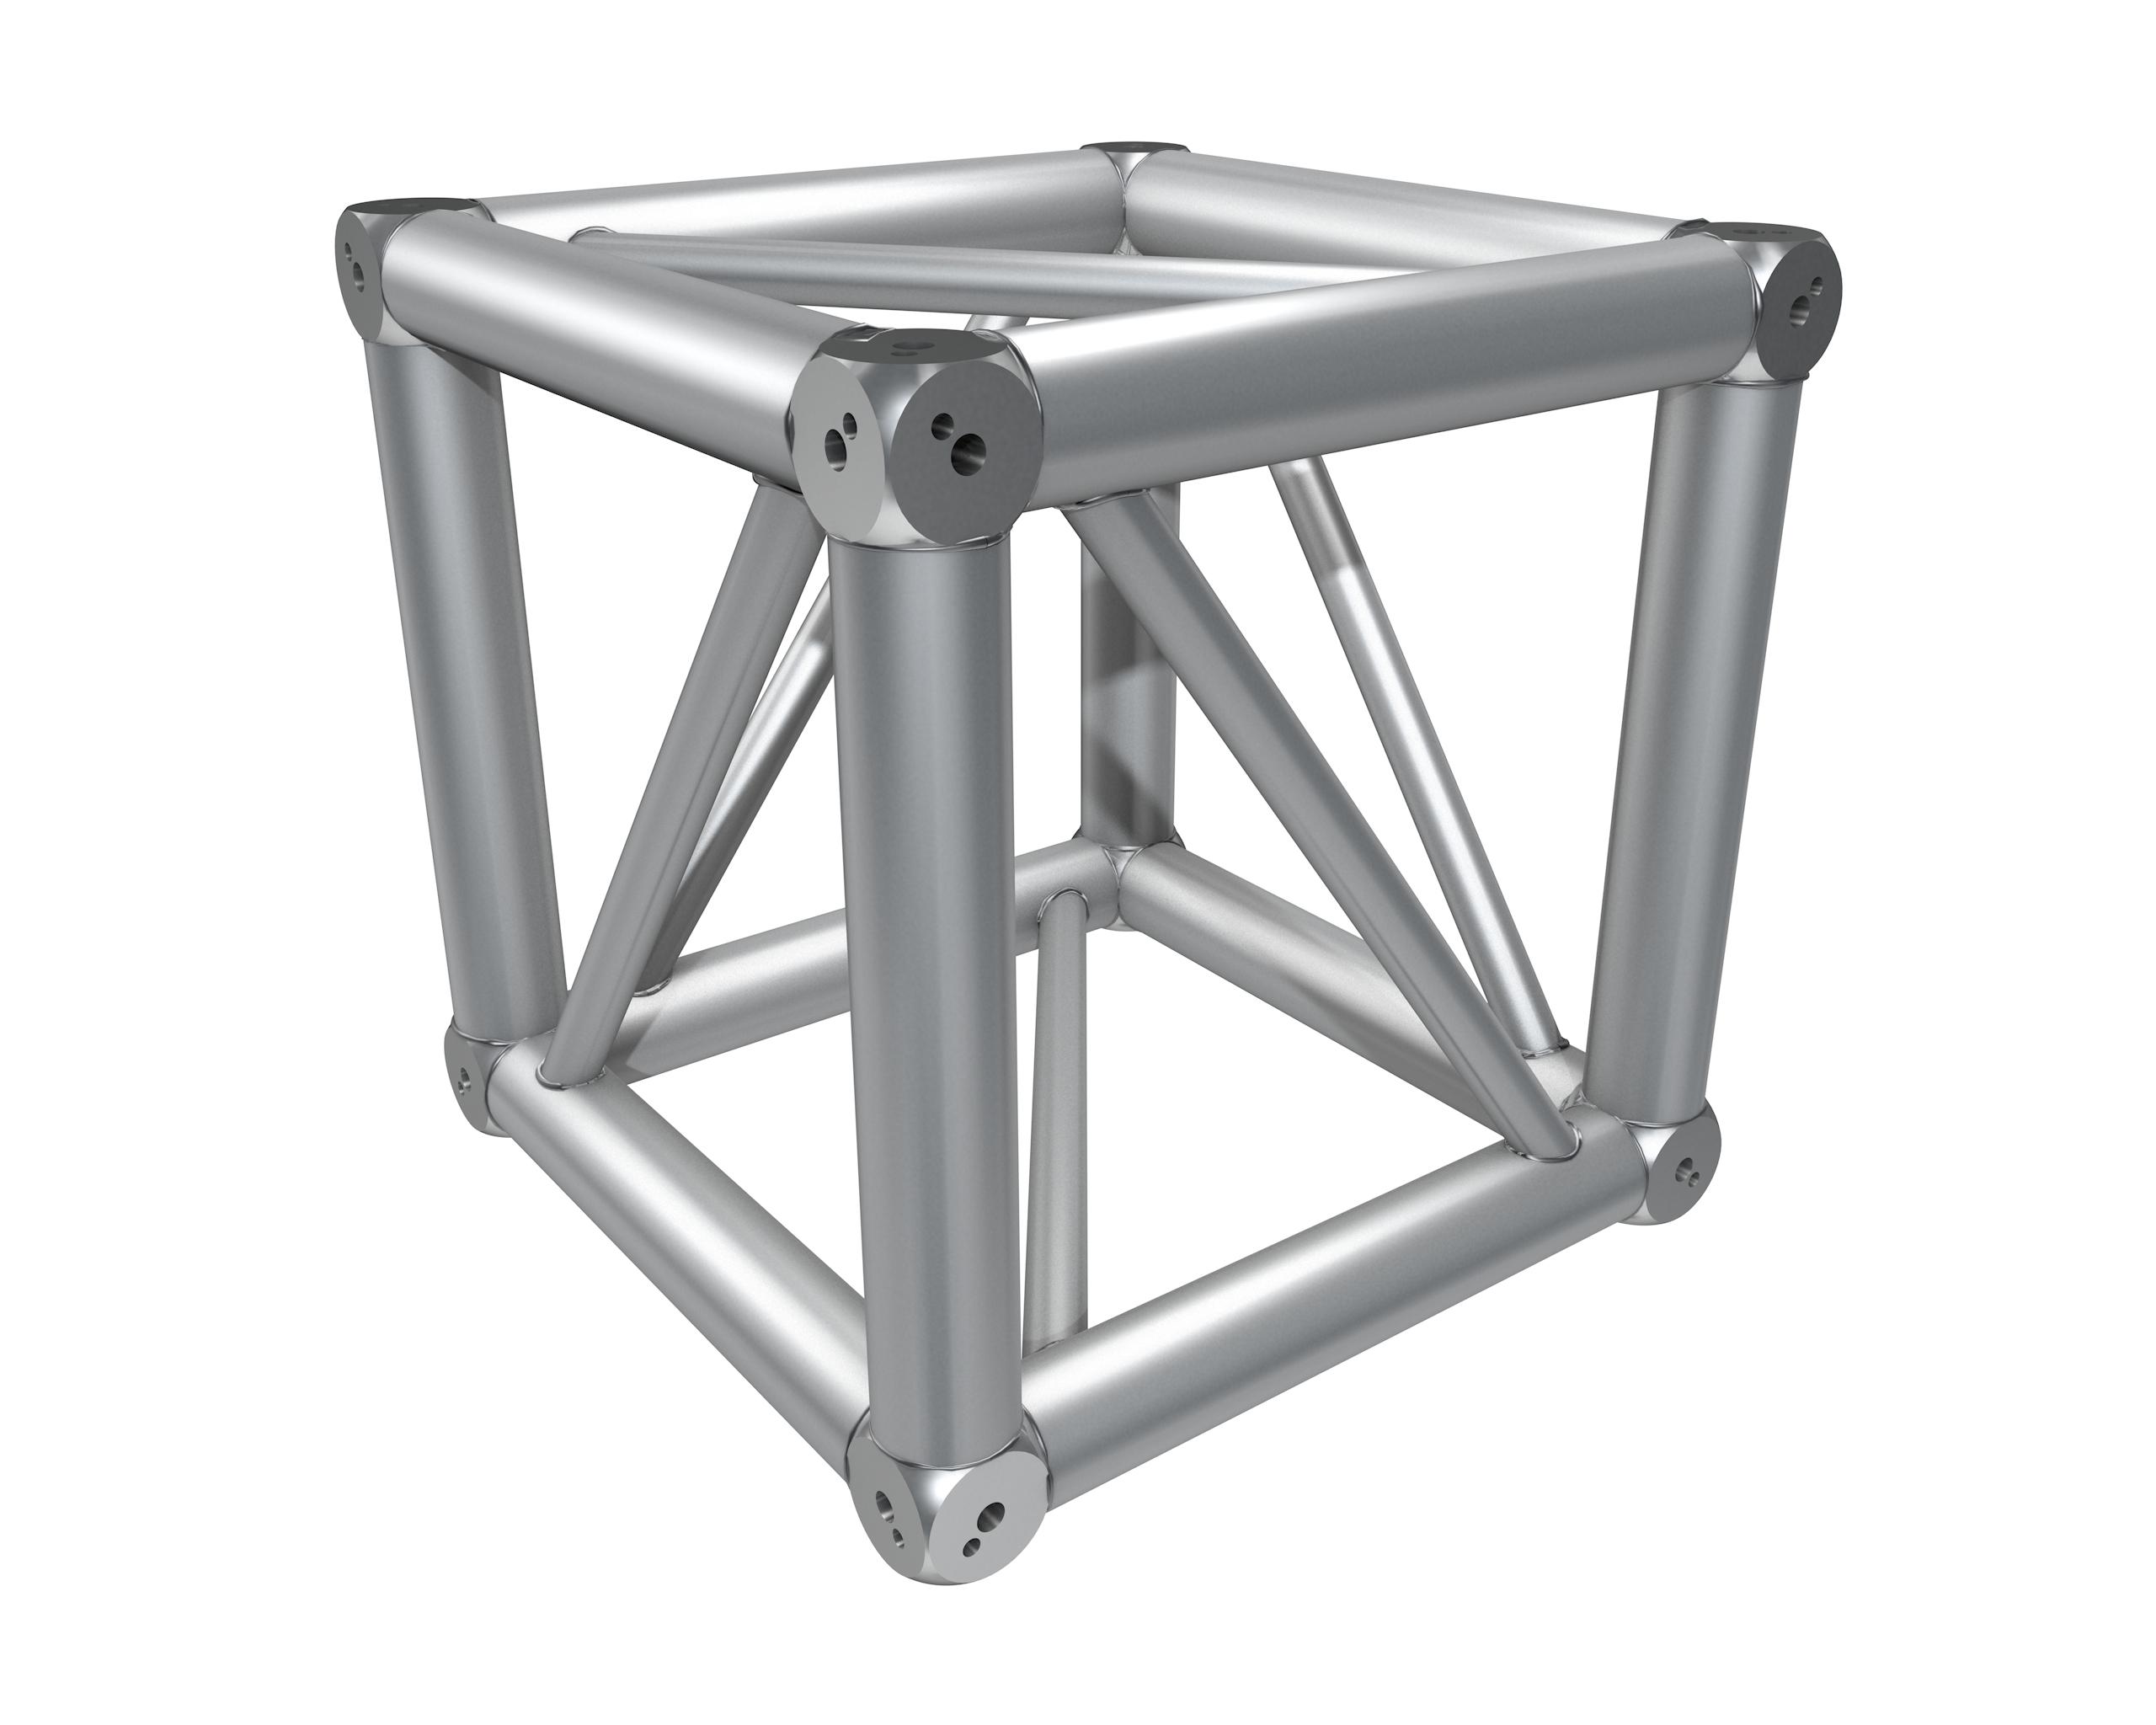 F54 Boxcorner inkl. 8 Verbinder